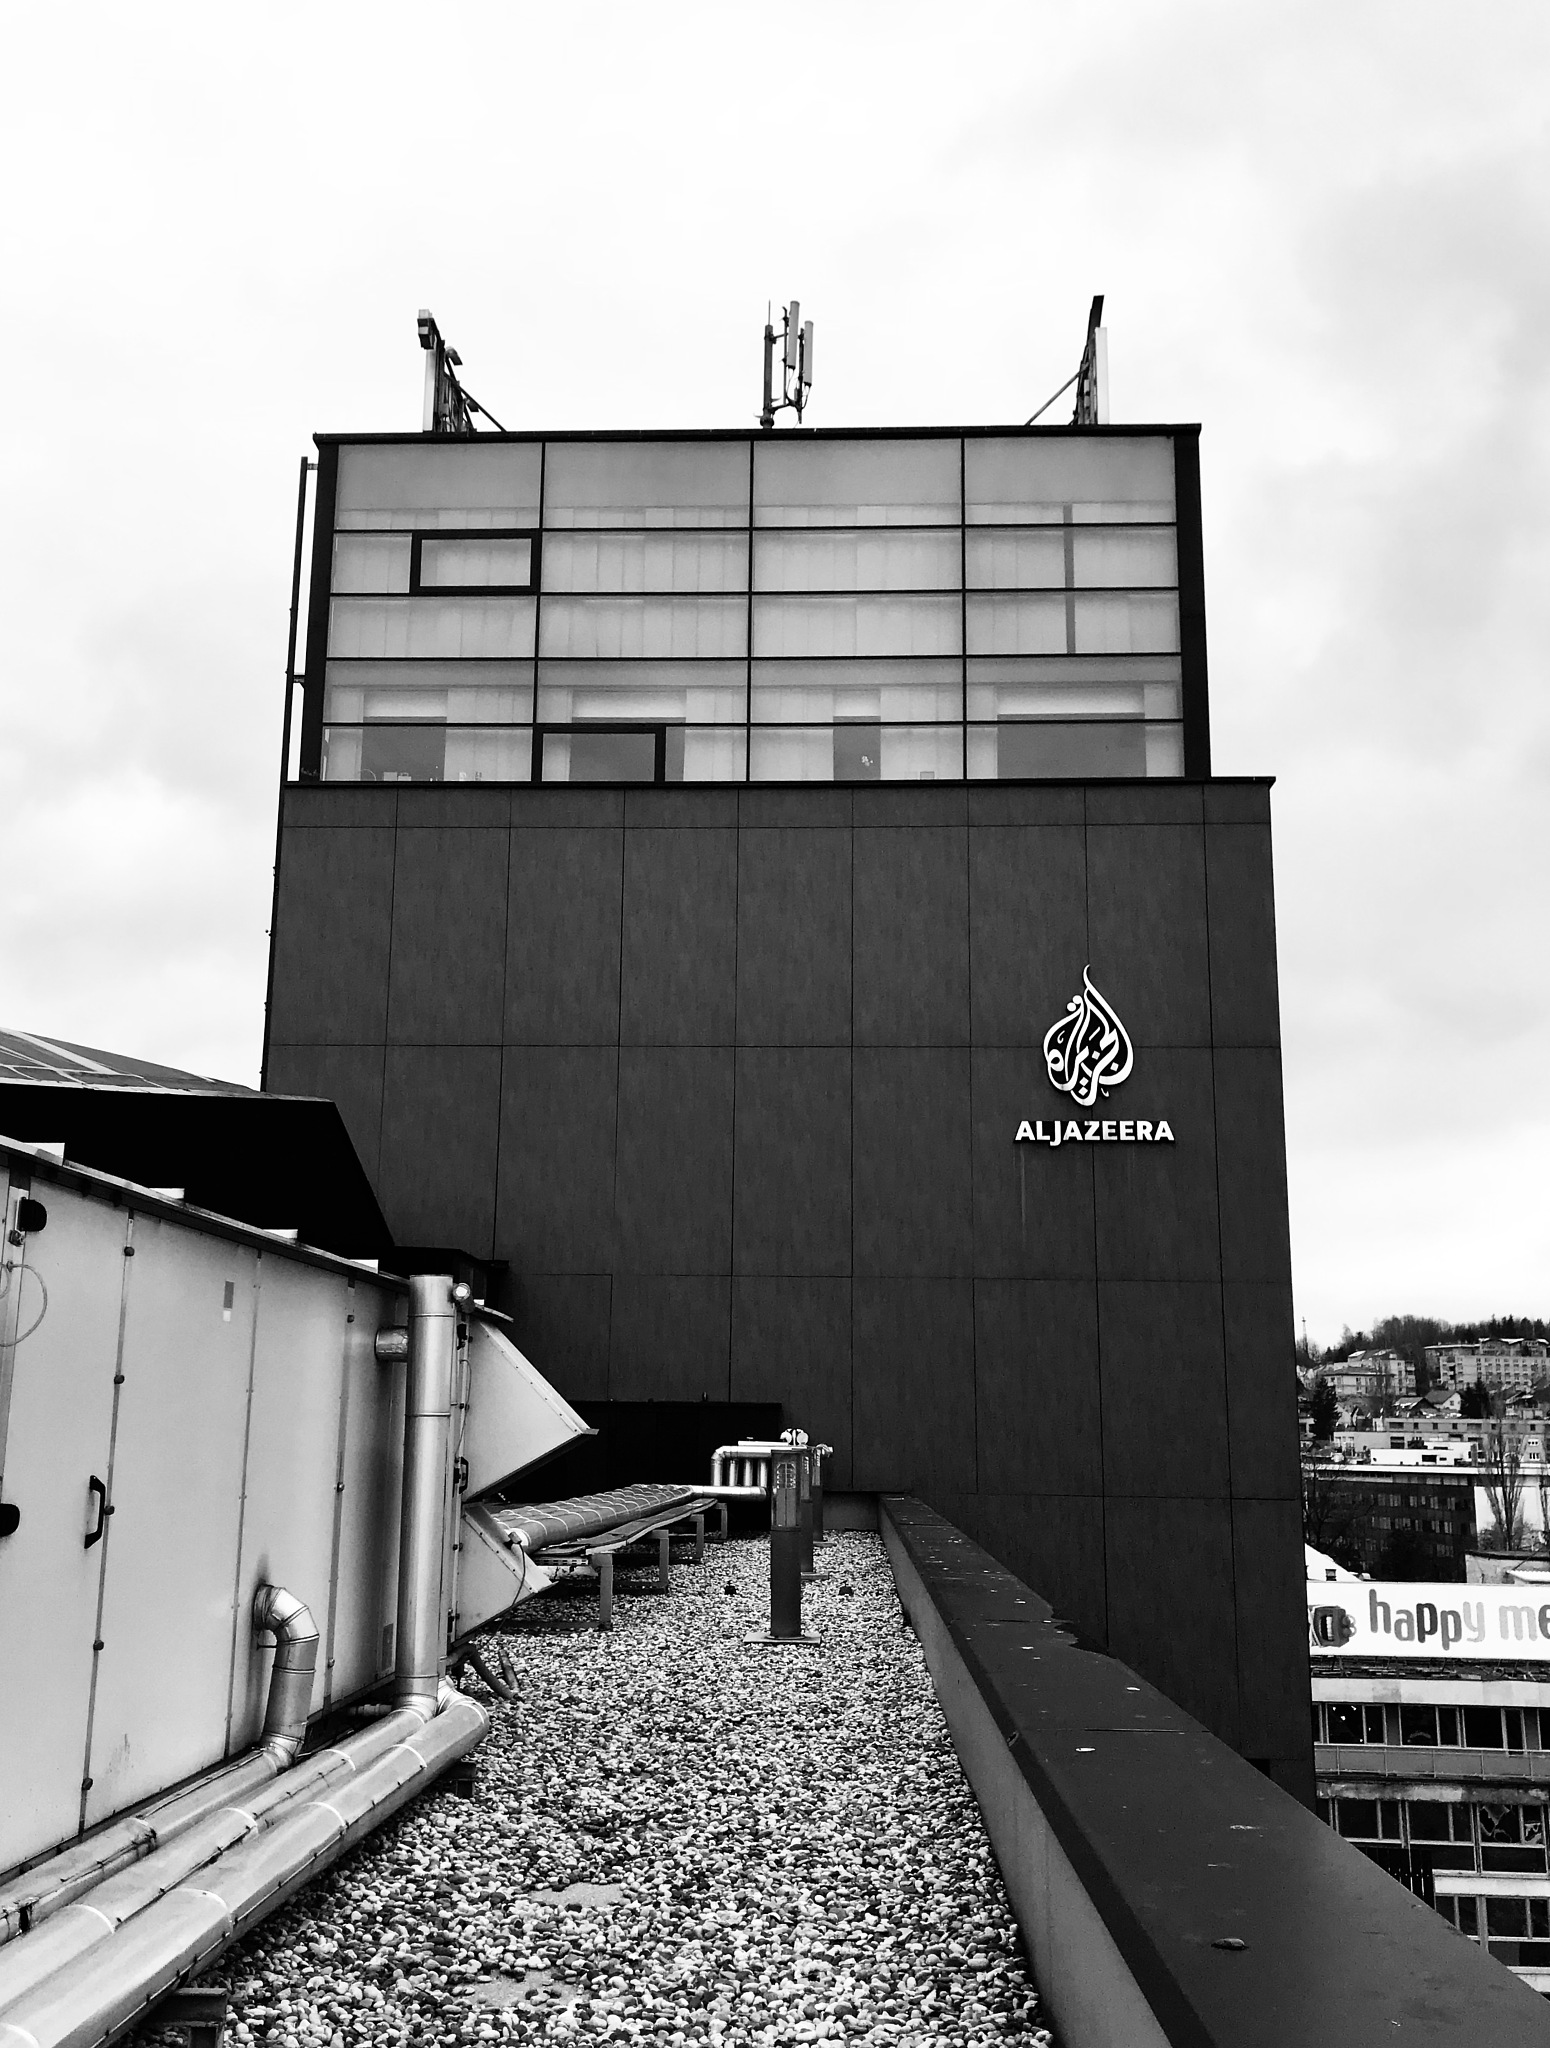 #ajbalkans #makingnews #journalism #urbanarchitecture #cityscape #sarajevo by Anne Marie Alves-Curcic